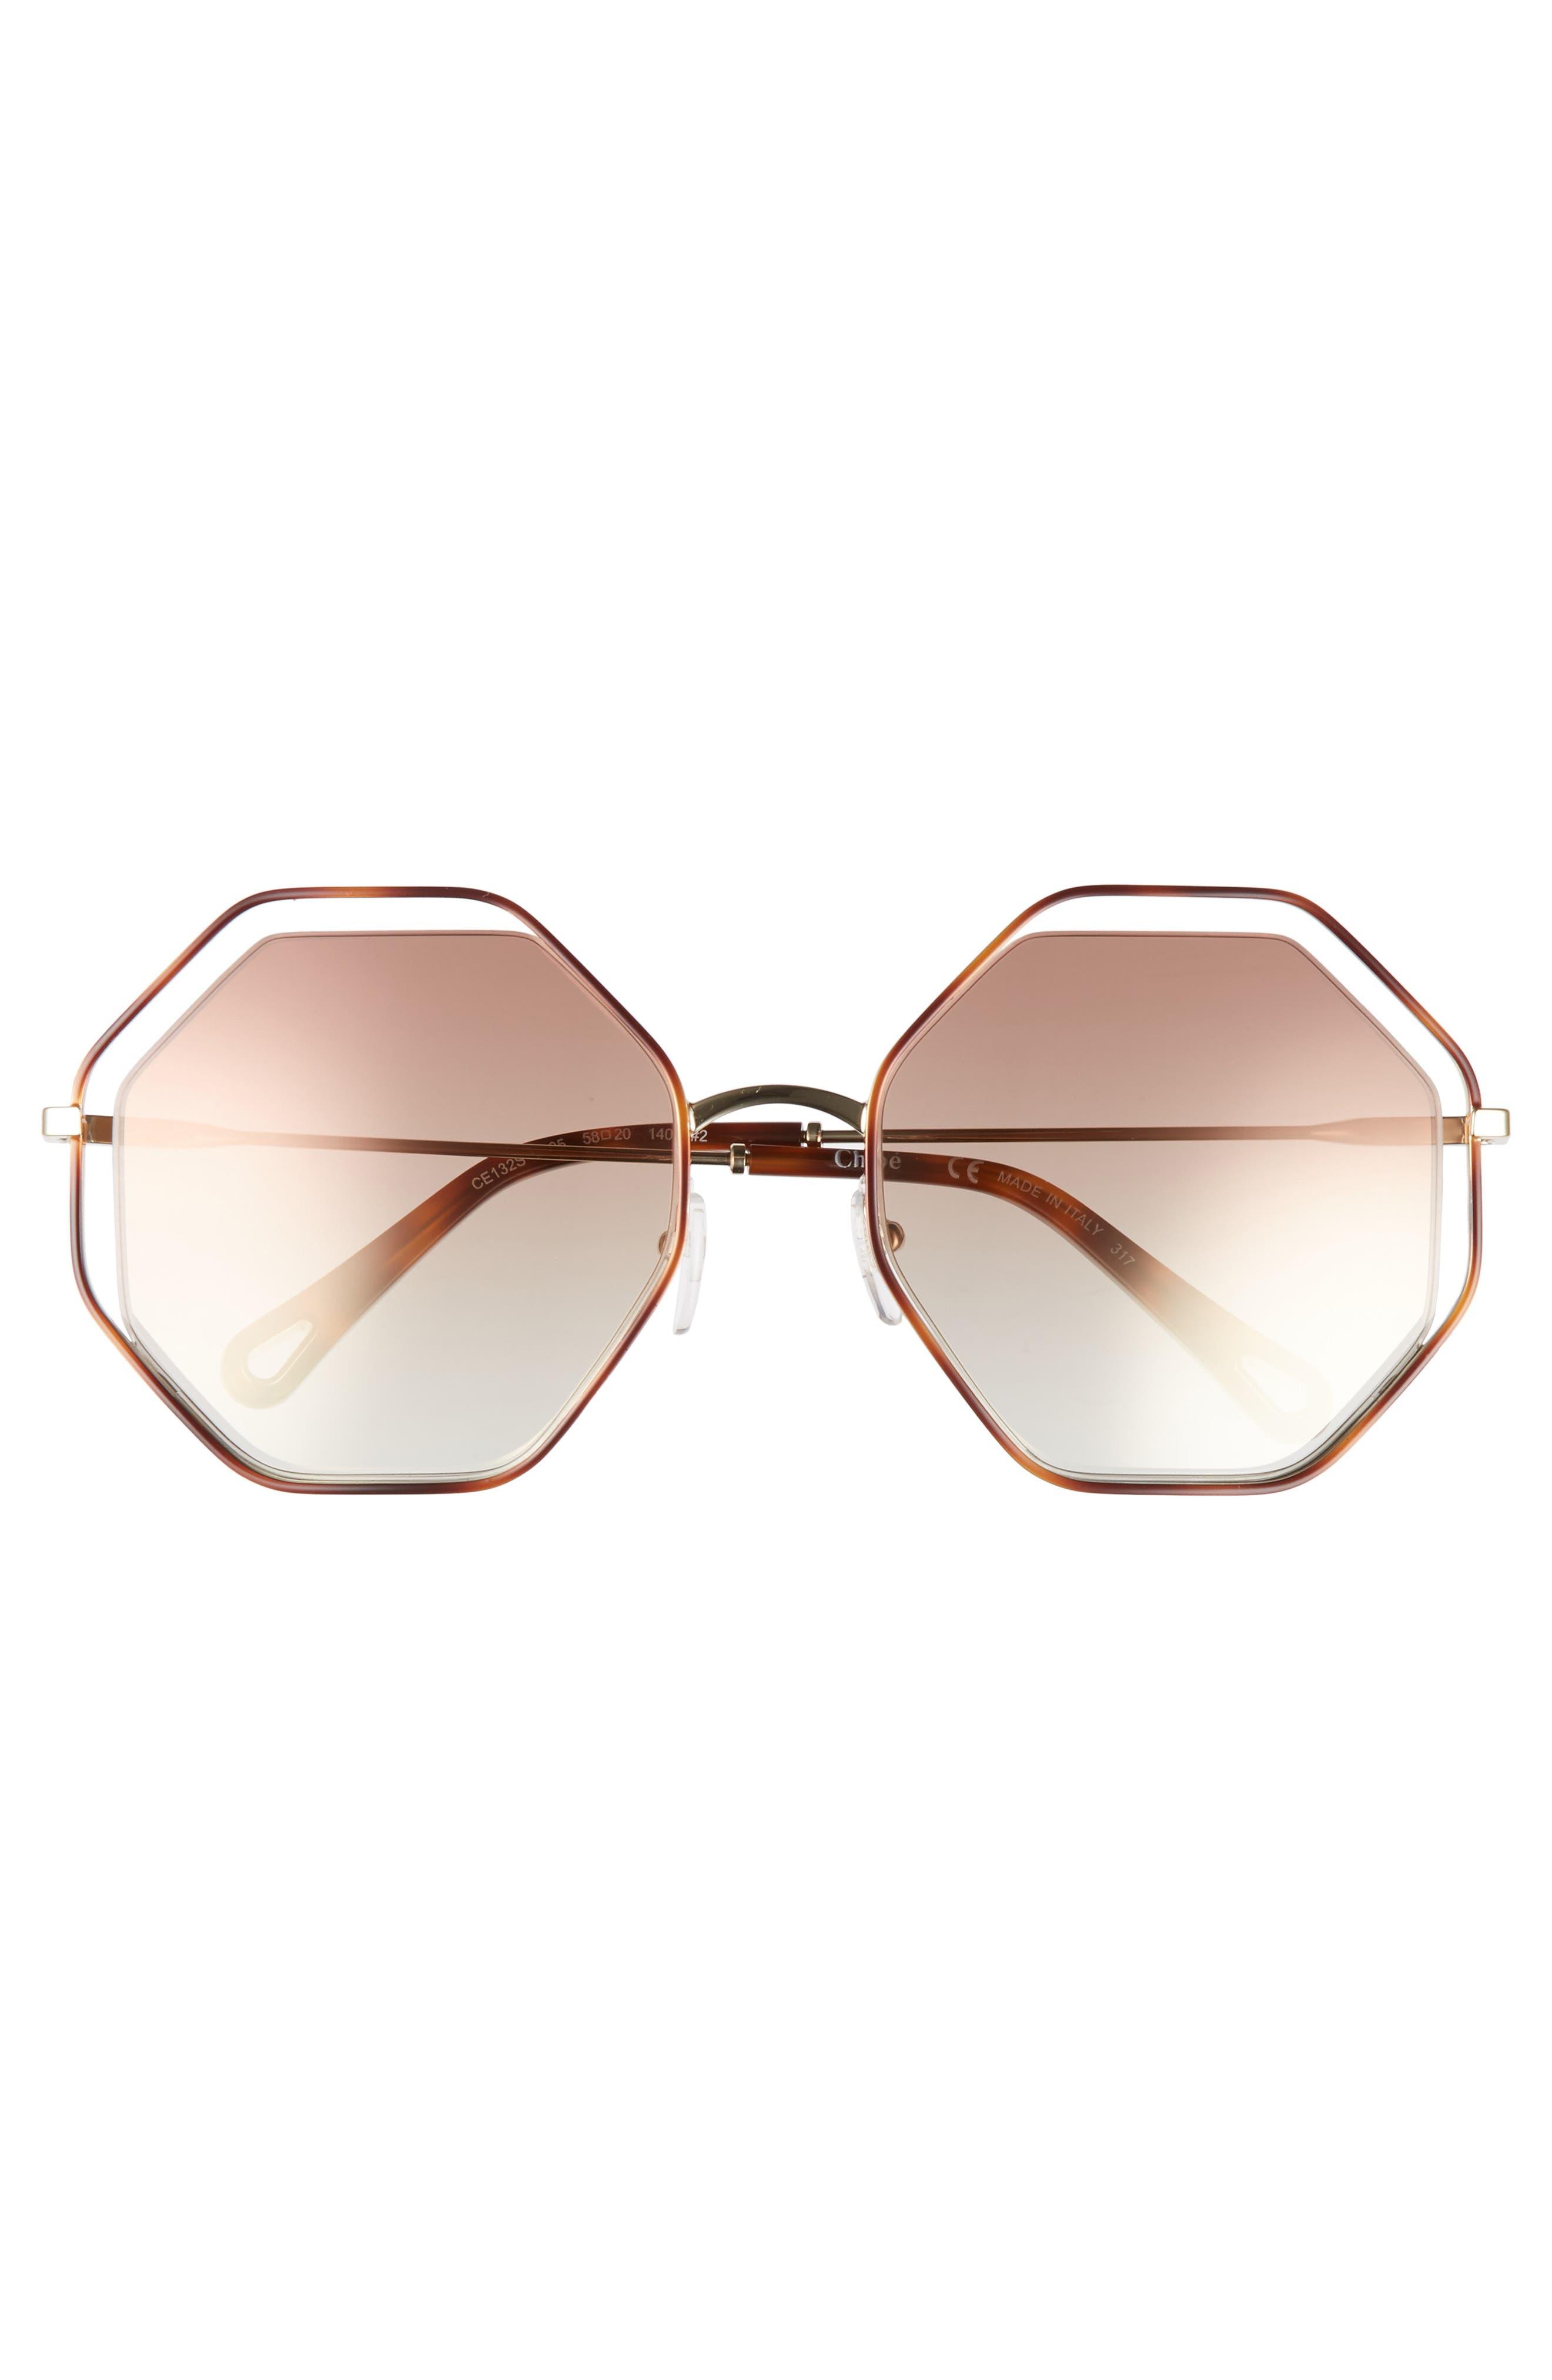 58mm Octagonal Halo Lens Sunglasses,                             Alternate thumbnail 3, color,                             HAVANA/ BRONZE